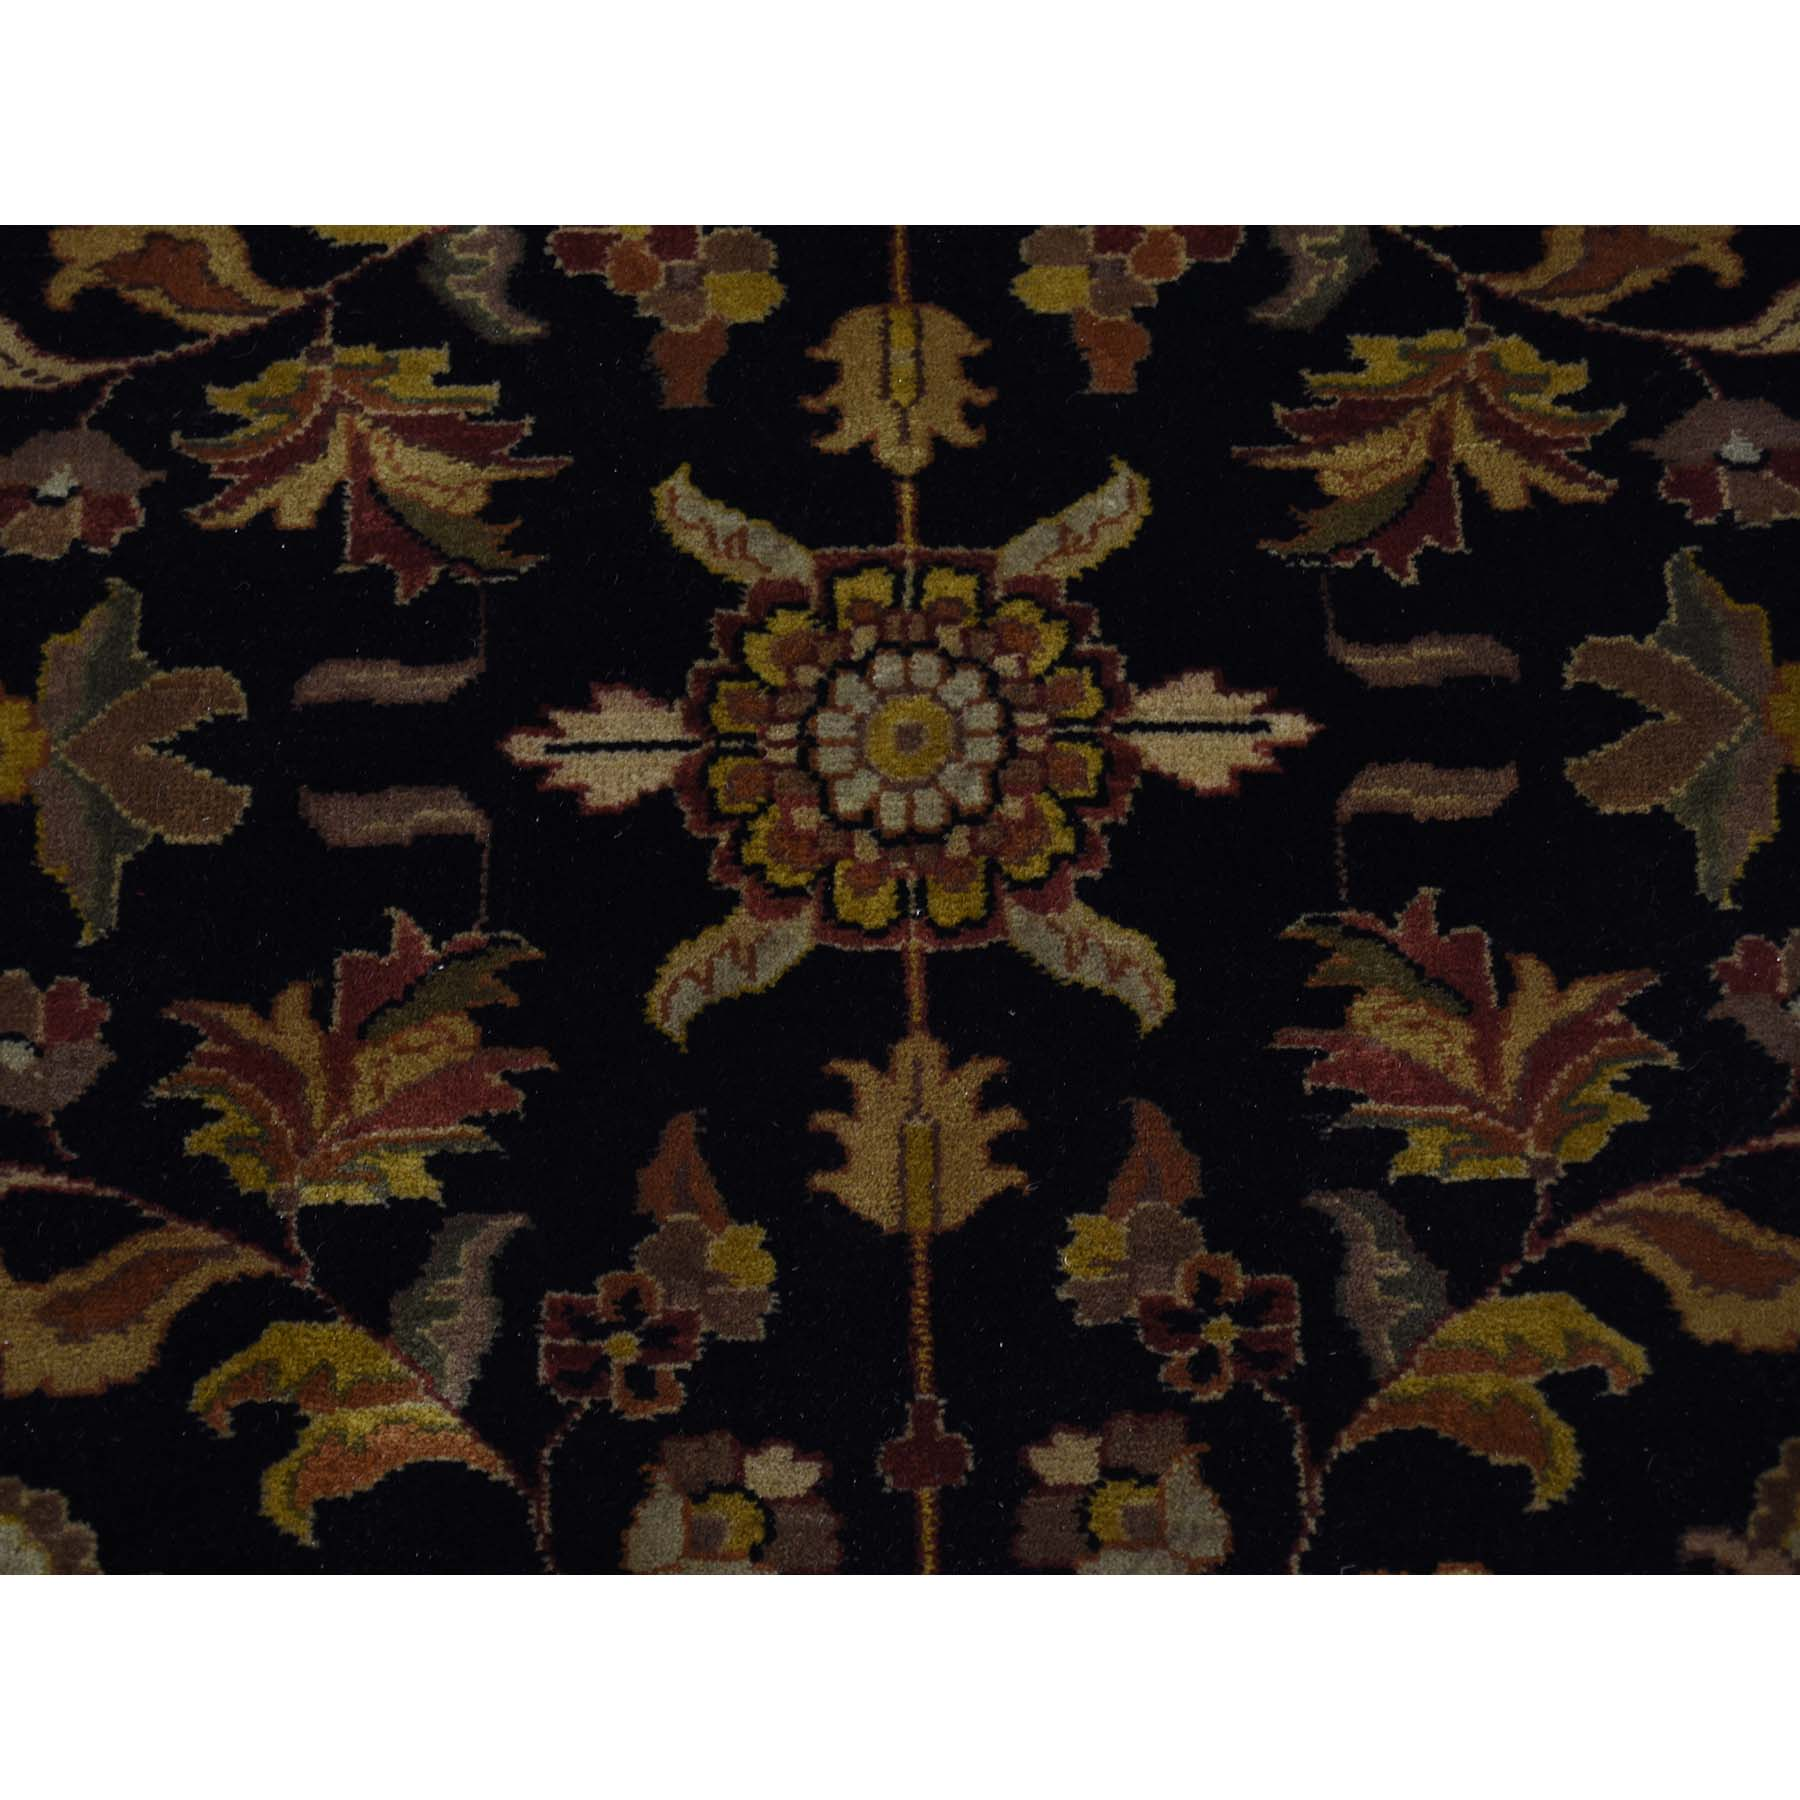 10-x10-1  New Zealand Wool Tabriz 300 KPSI Hand Spun Round Hand-Knotted Oriental Rug